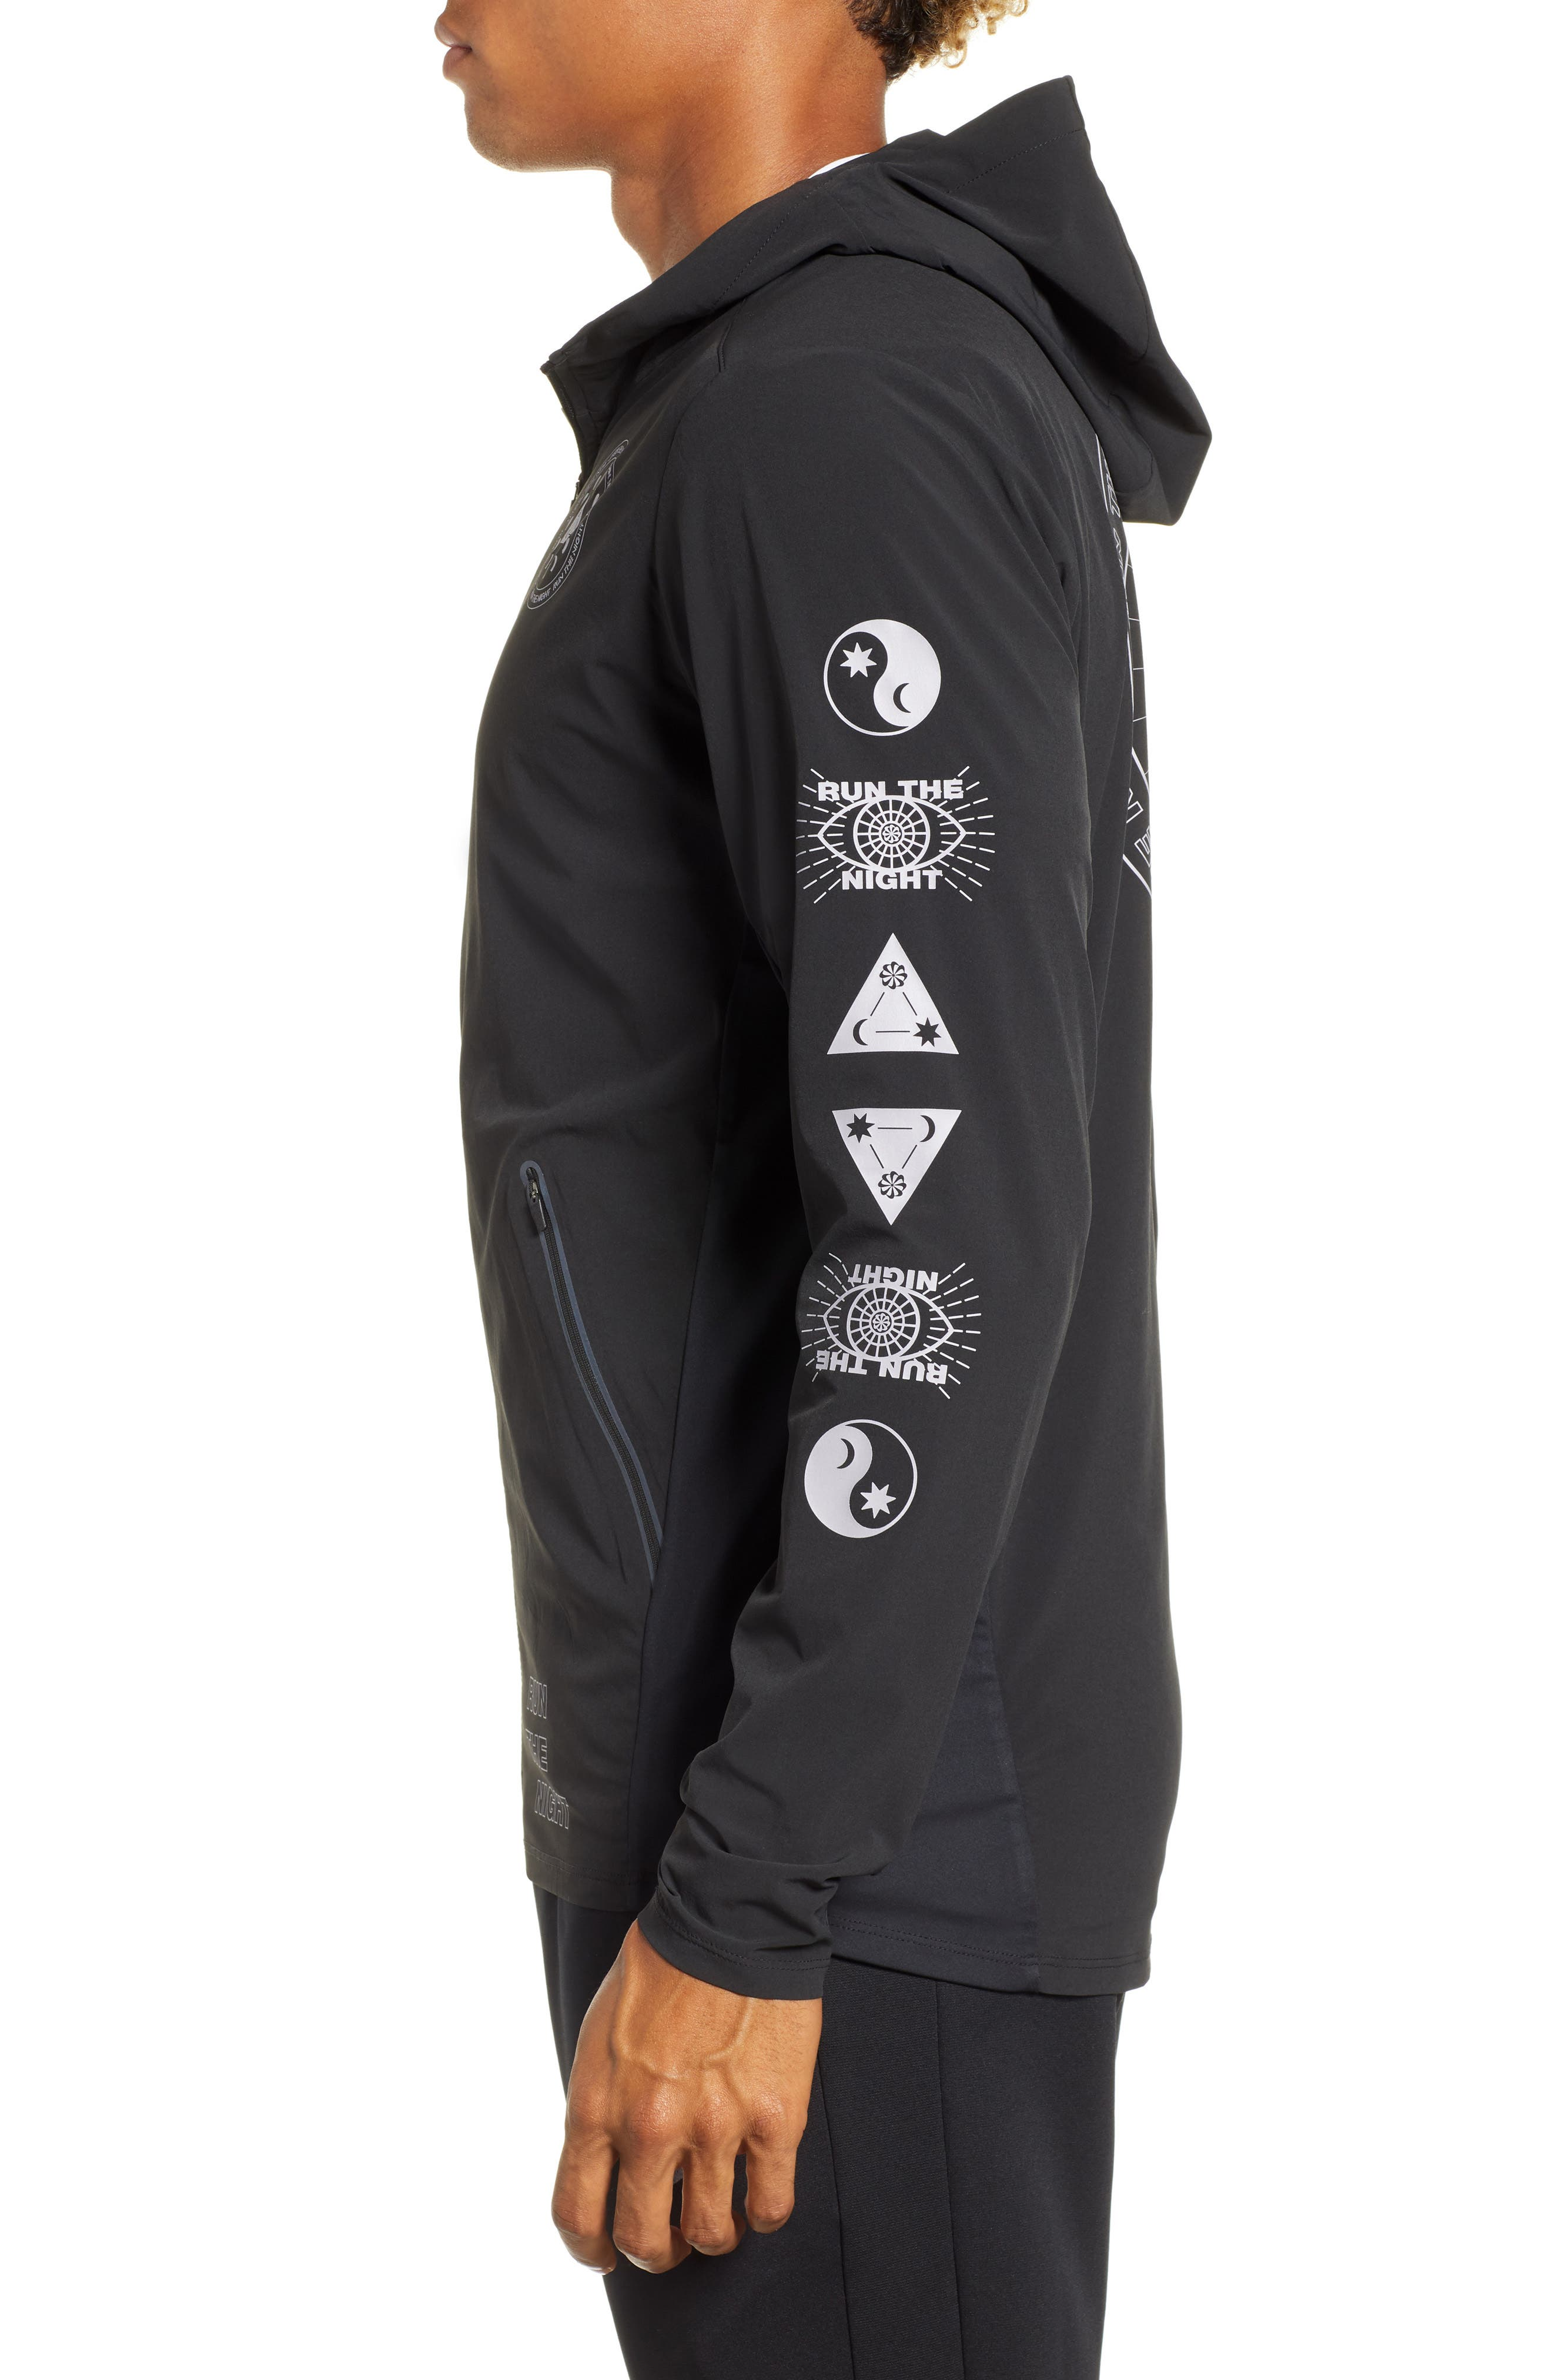 Winter Solstice Reflective Running Jacket,                             Alternate thumbnail 4, color,                             BLACK/ PROVENCE PURPLE